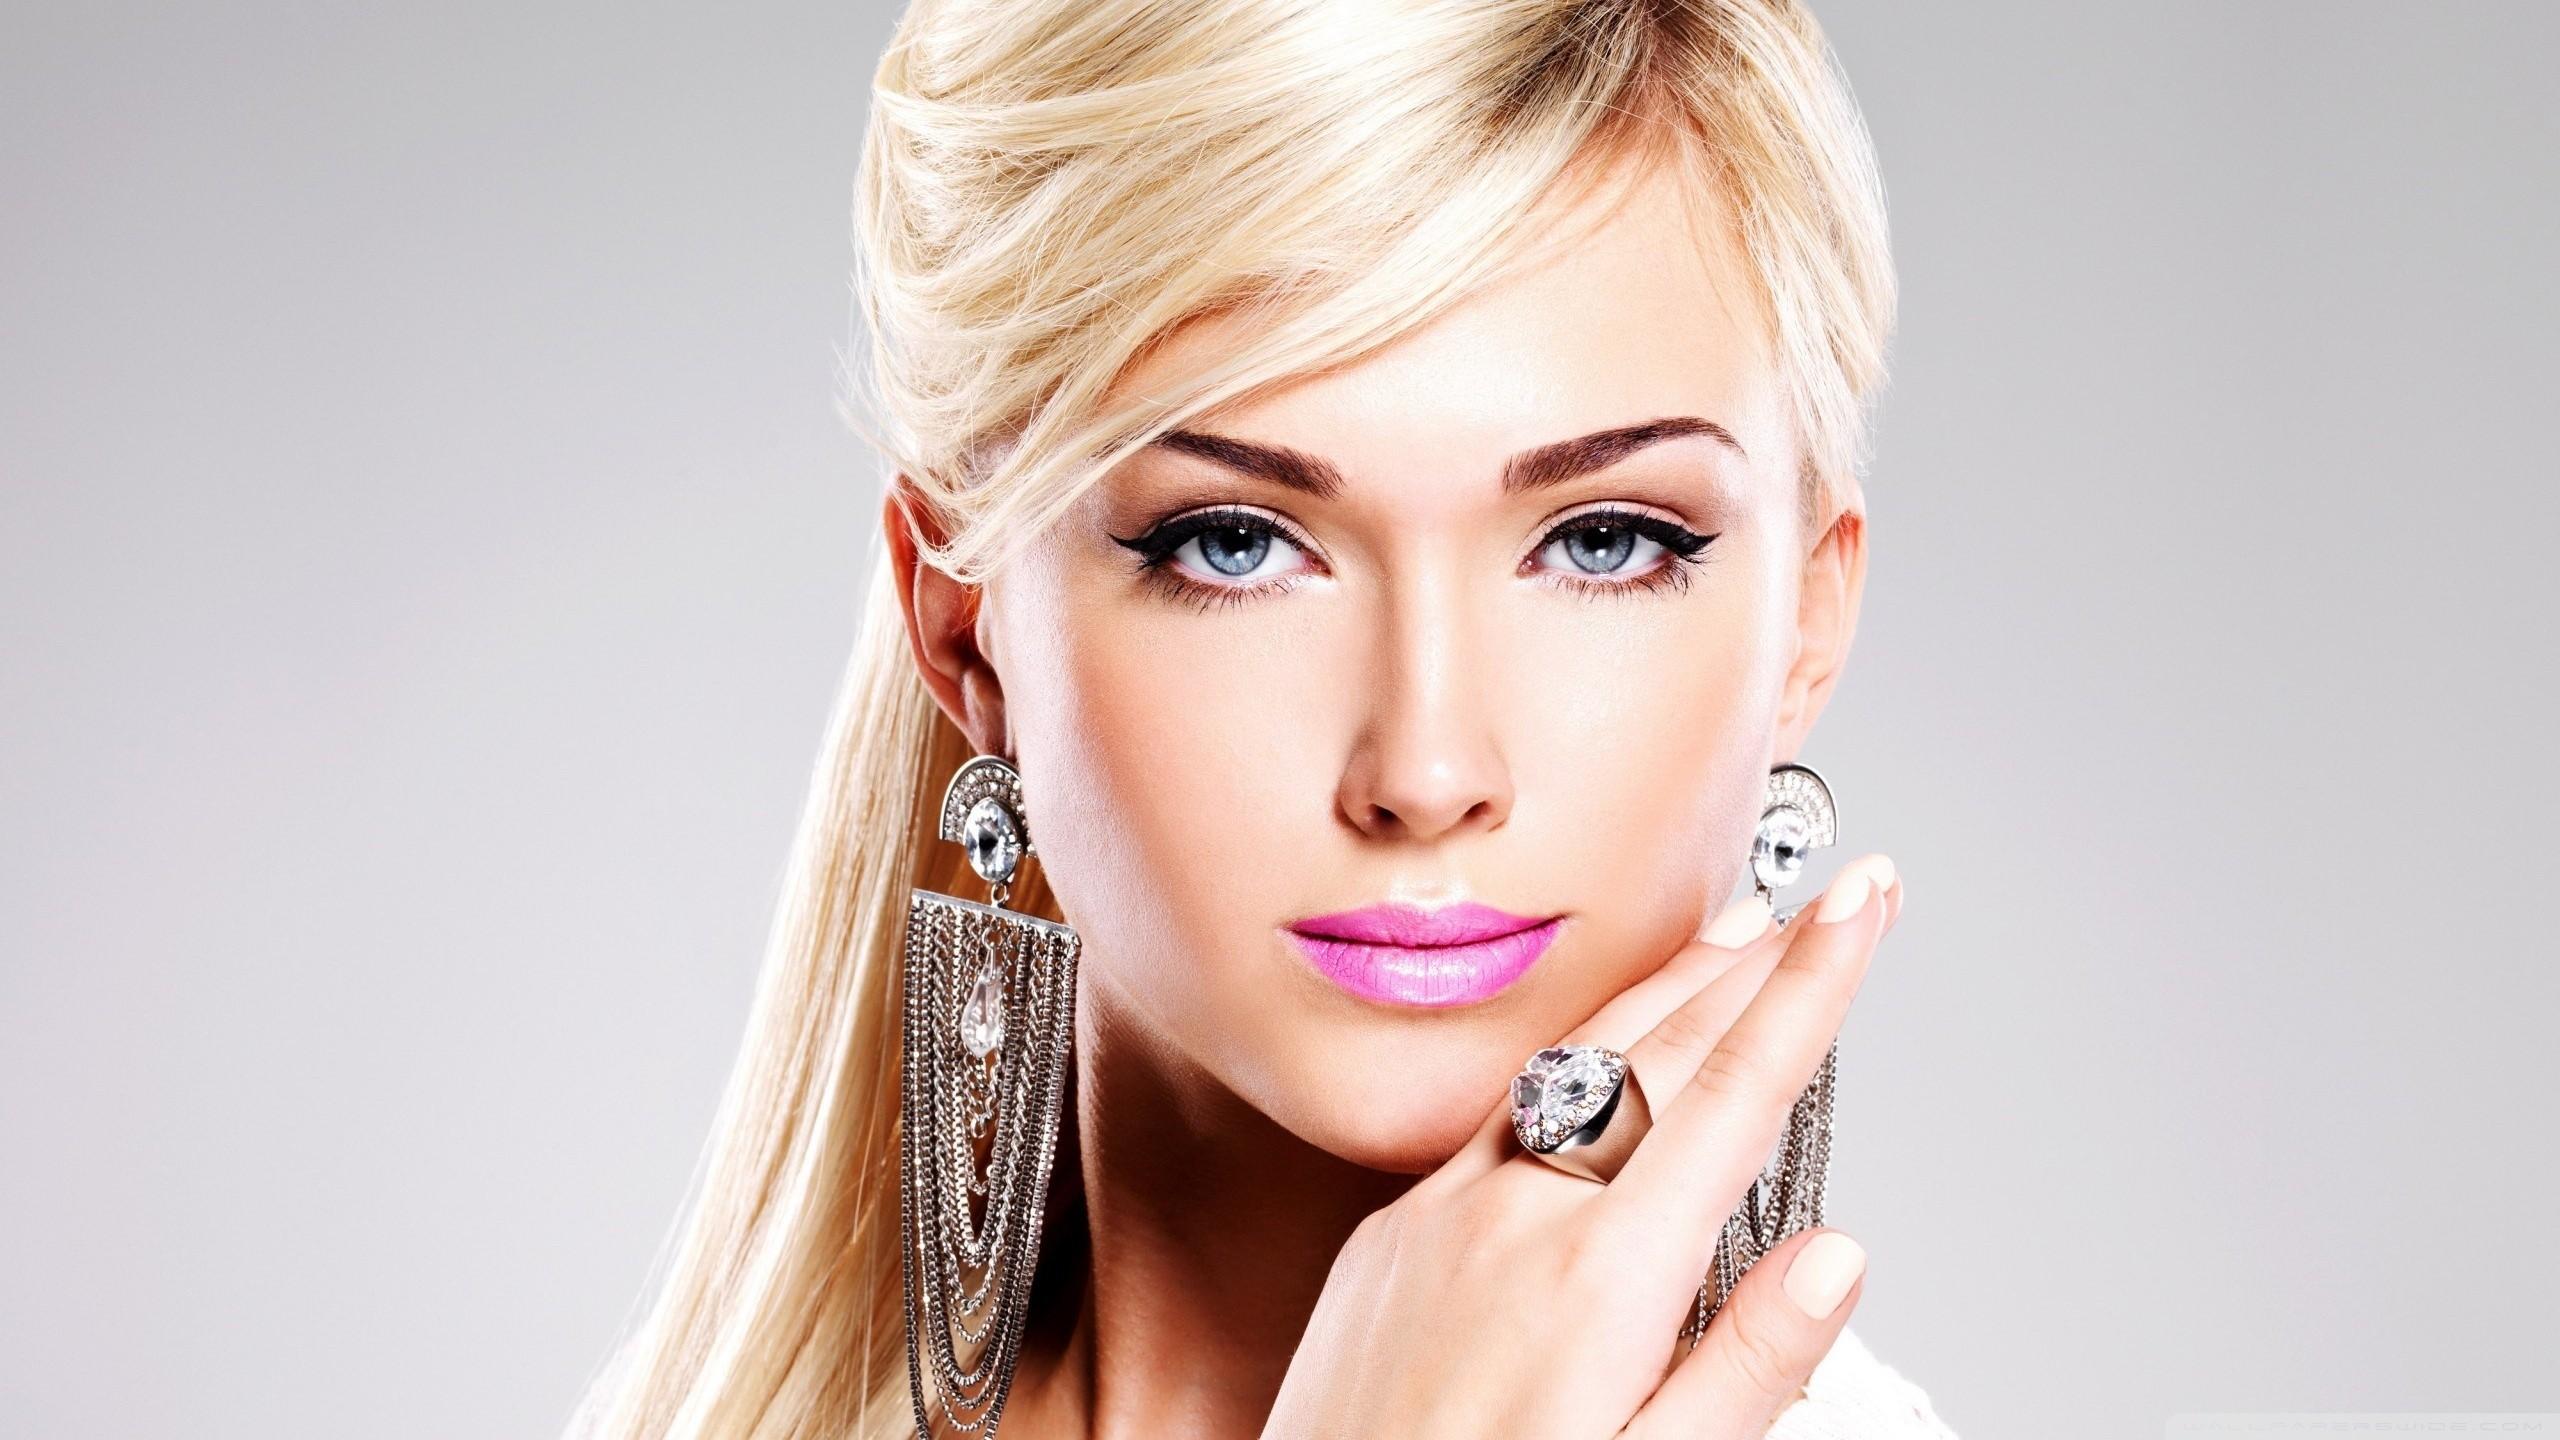 Red Lipstick Brown Hair Blue Eyes: Fondos De Pantalla : Cara, Mujer, Modelo, Rubia, Pelo